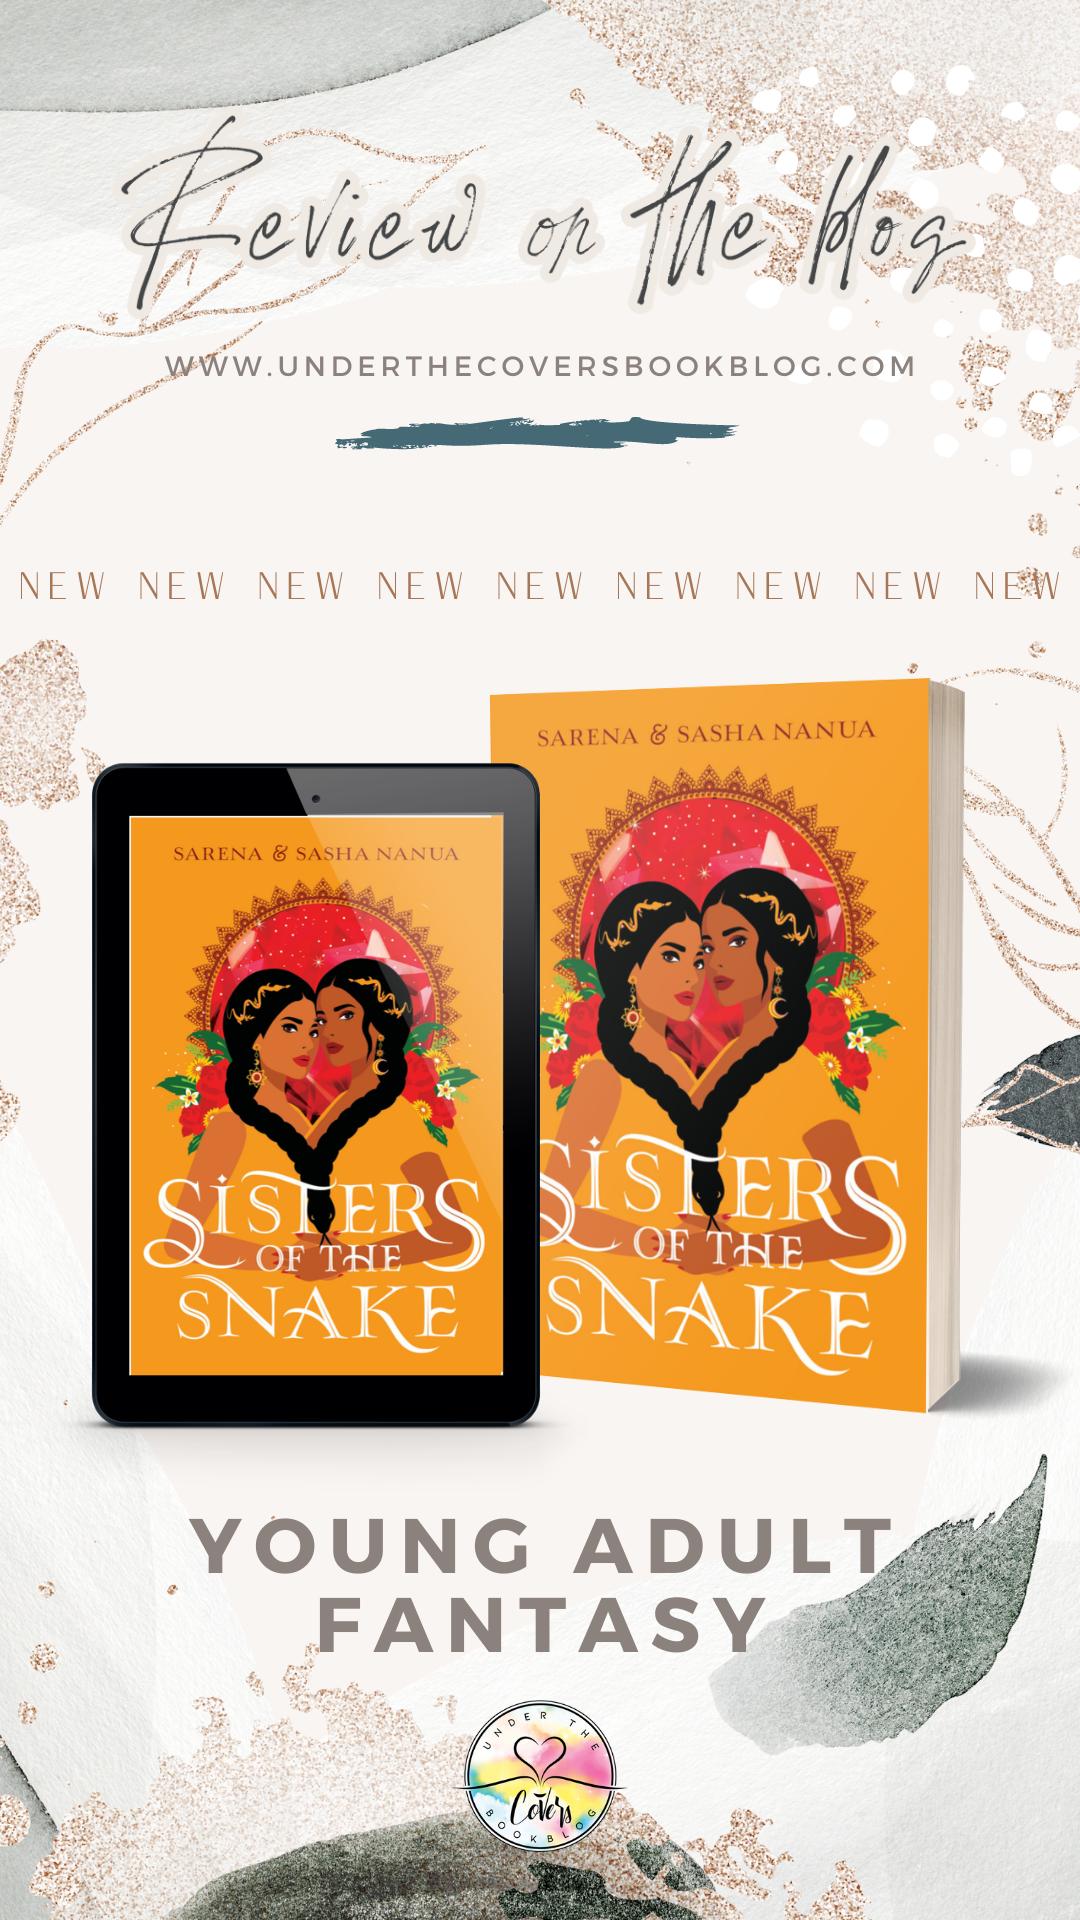 ARC Review: Sisters of the Snake by Sasha Nanua & Sarena Nanua